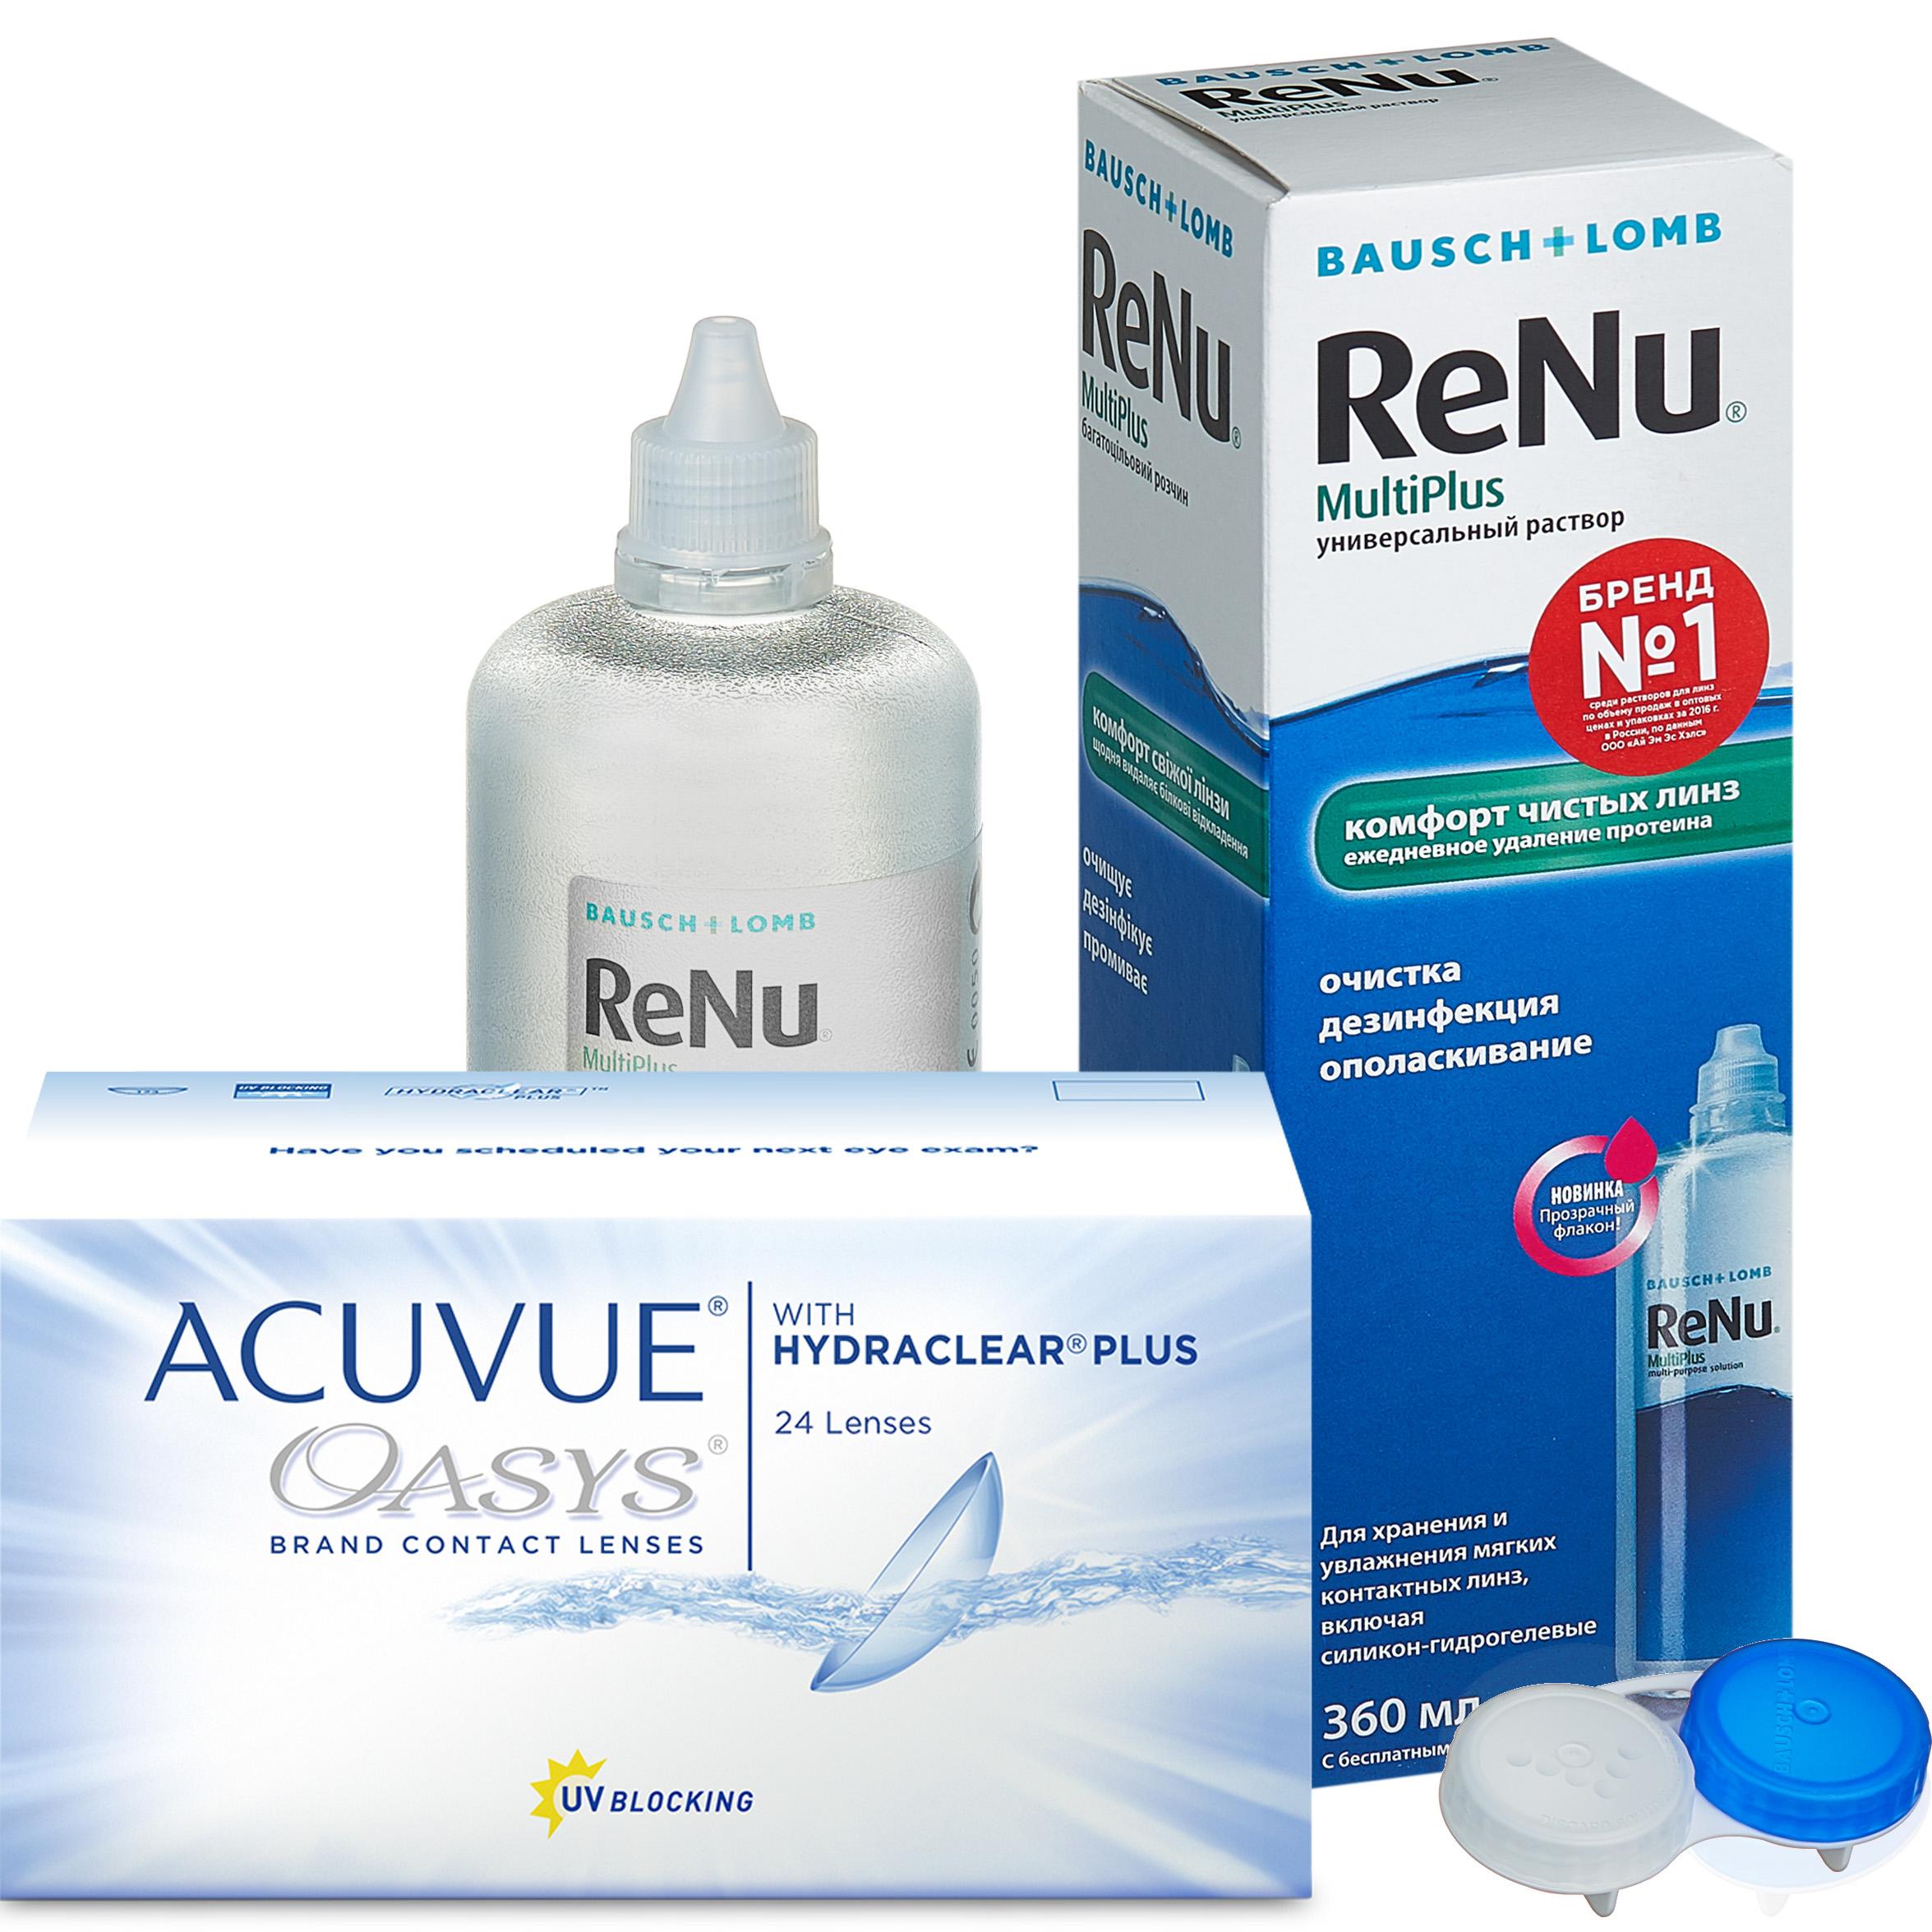 Купить Oasys with Hydraclear Plus 24 линзы + ReNu MultiPlus, Линзы Acuvue Oasys with Hydraclear Plus 24 линзы R 8.8 +3, 50 + ReNu Multi Plus 360 мл